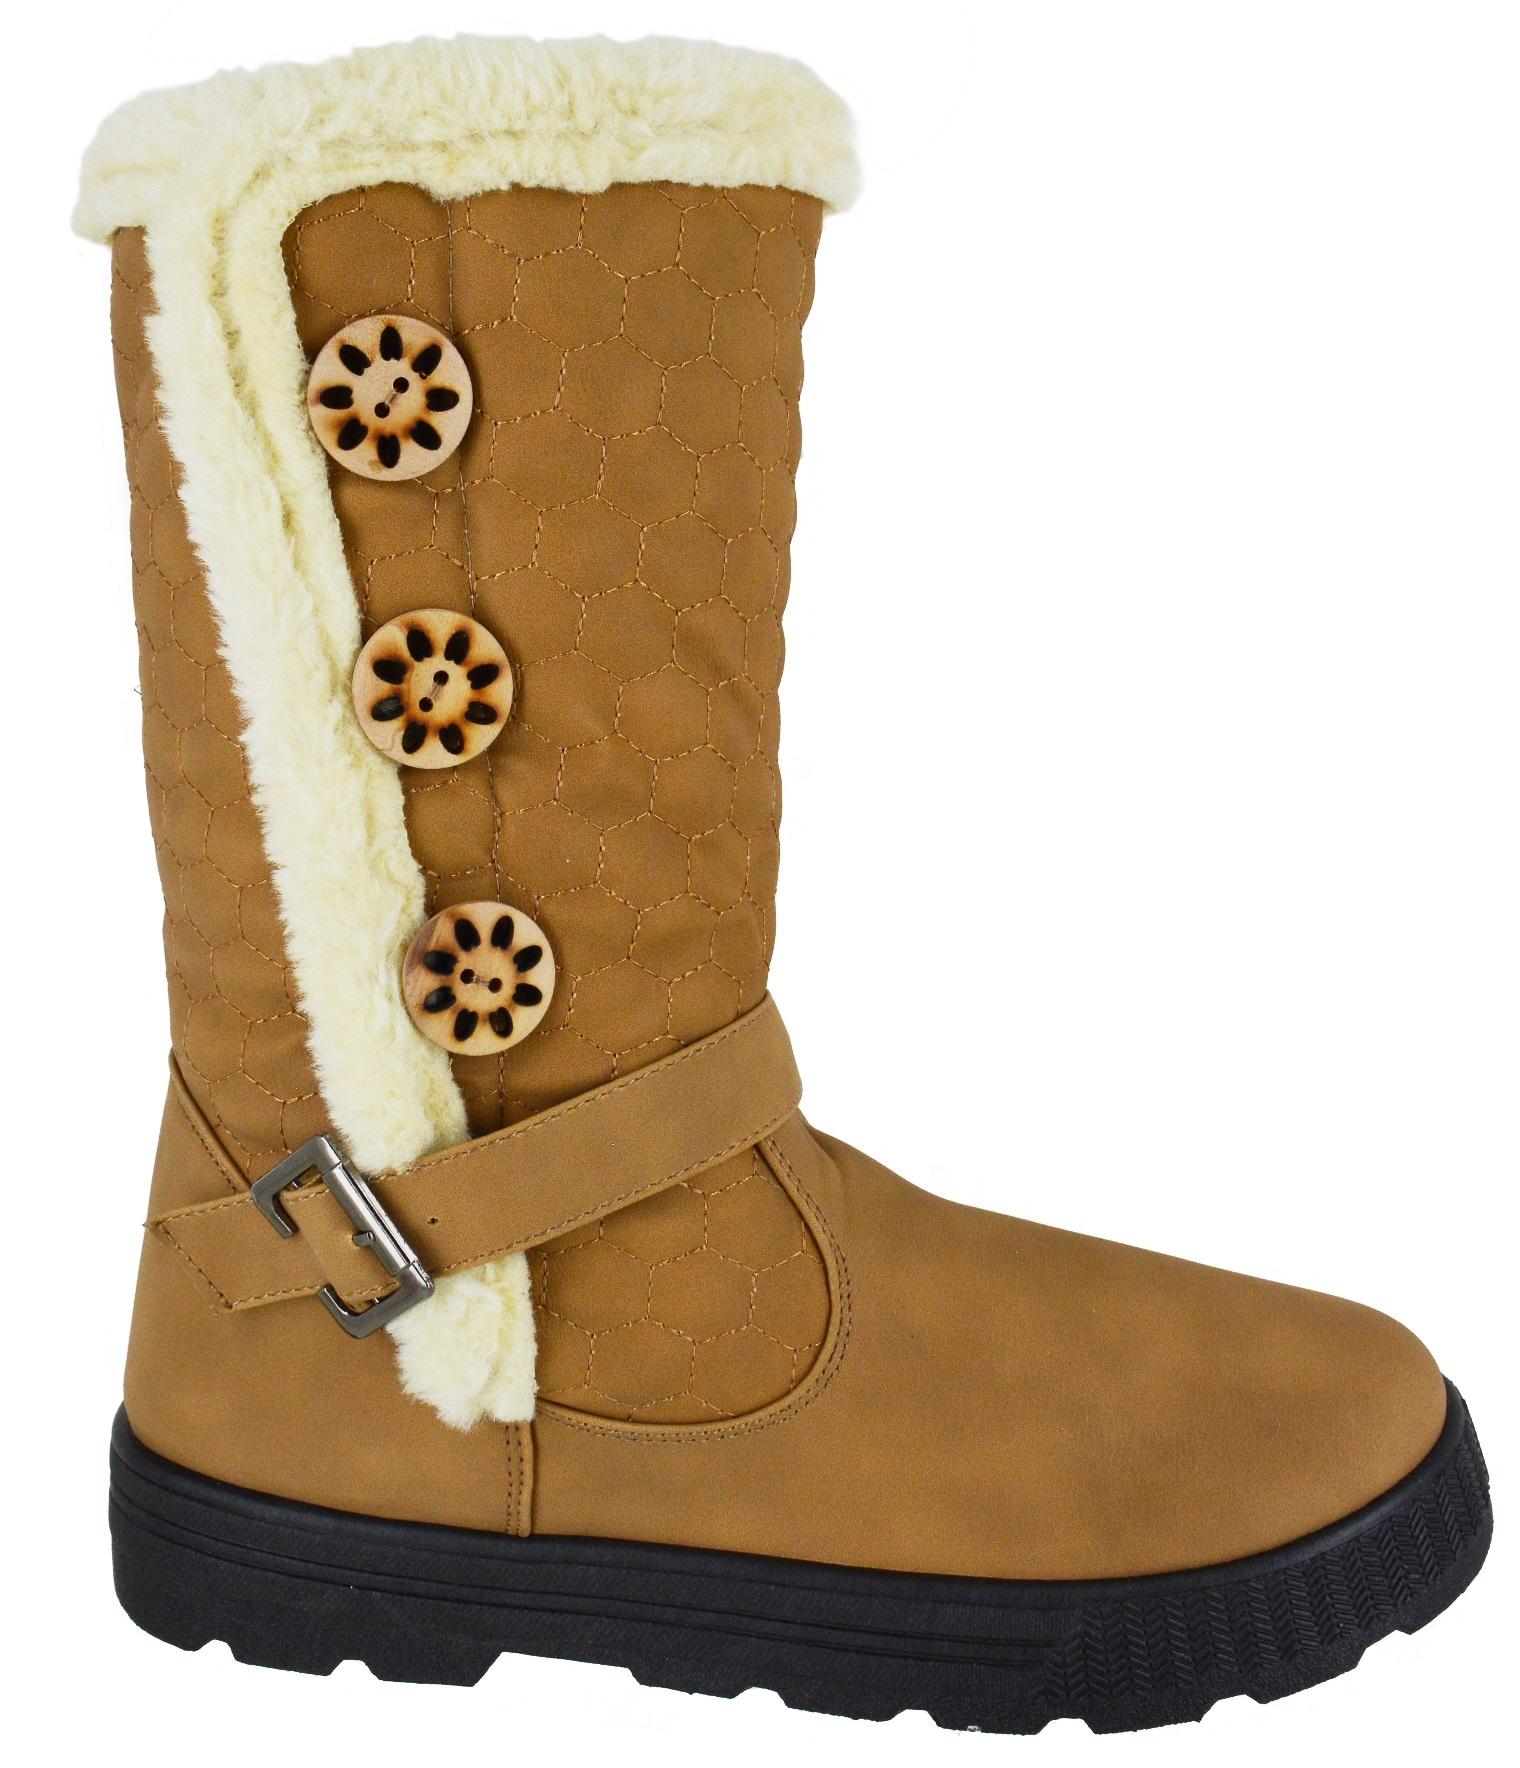 Vintage Snow Shoes Ebay Uk